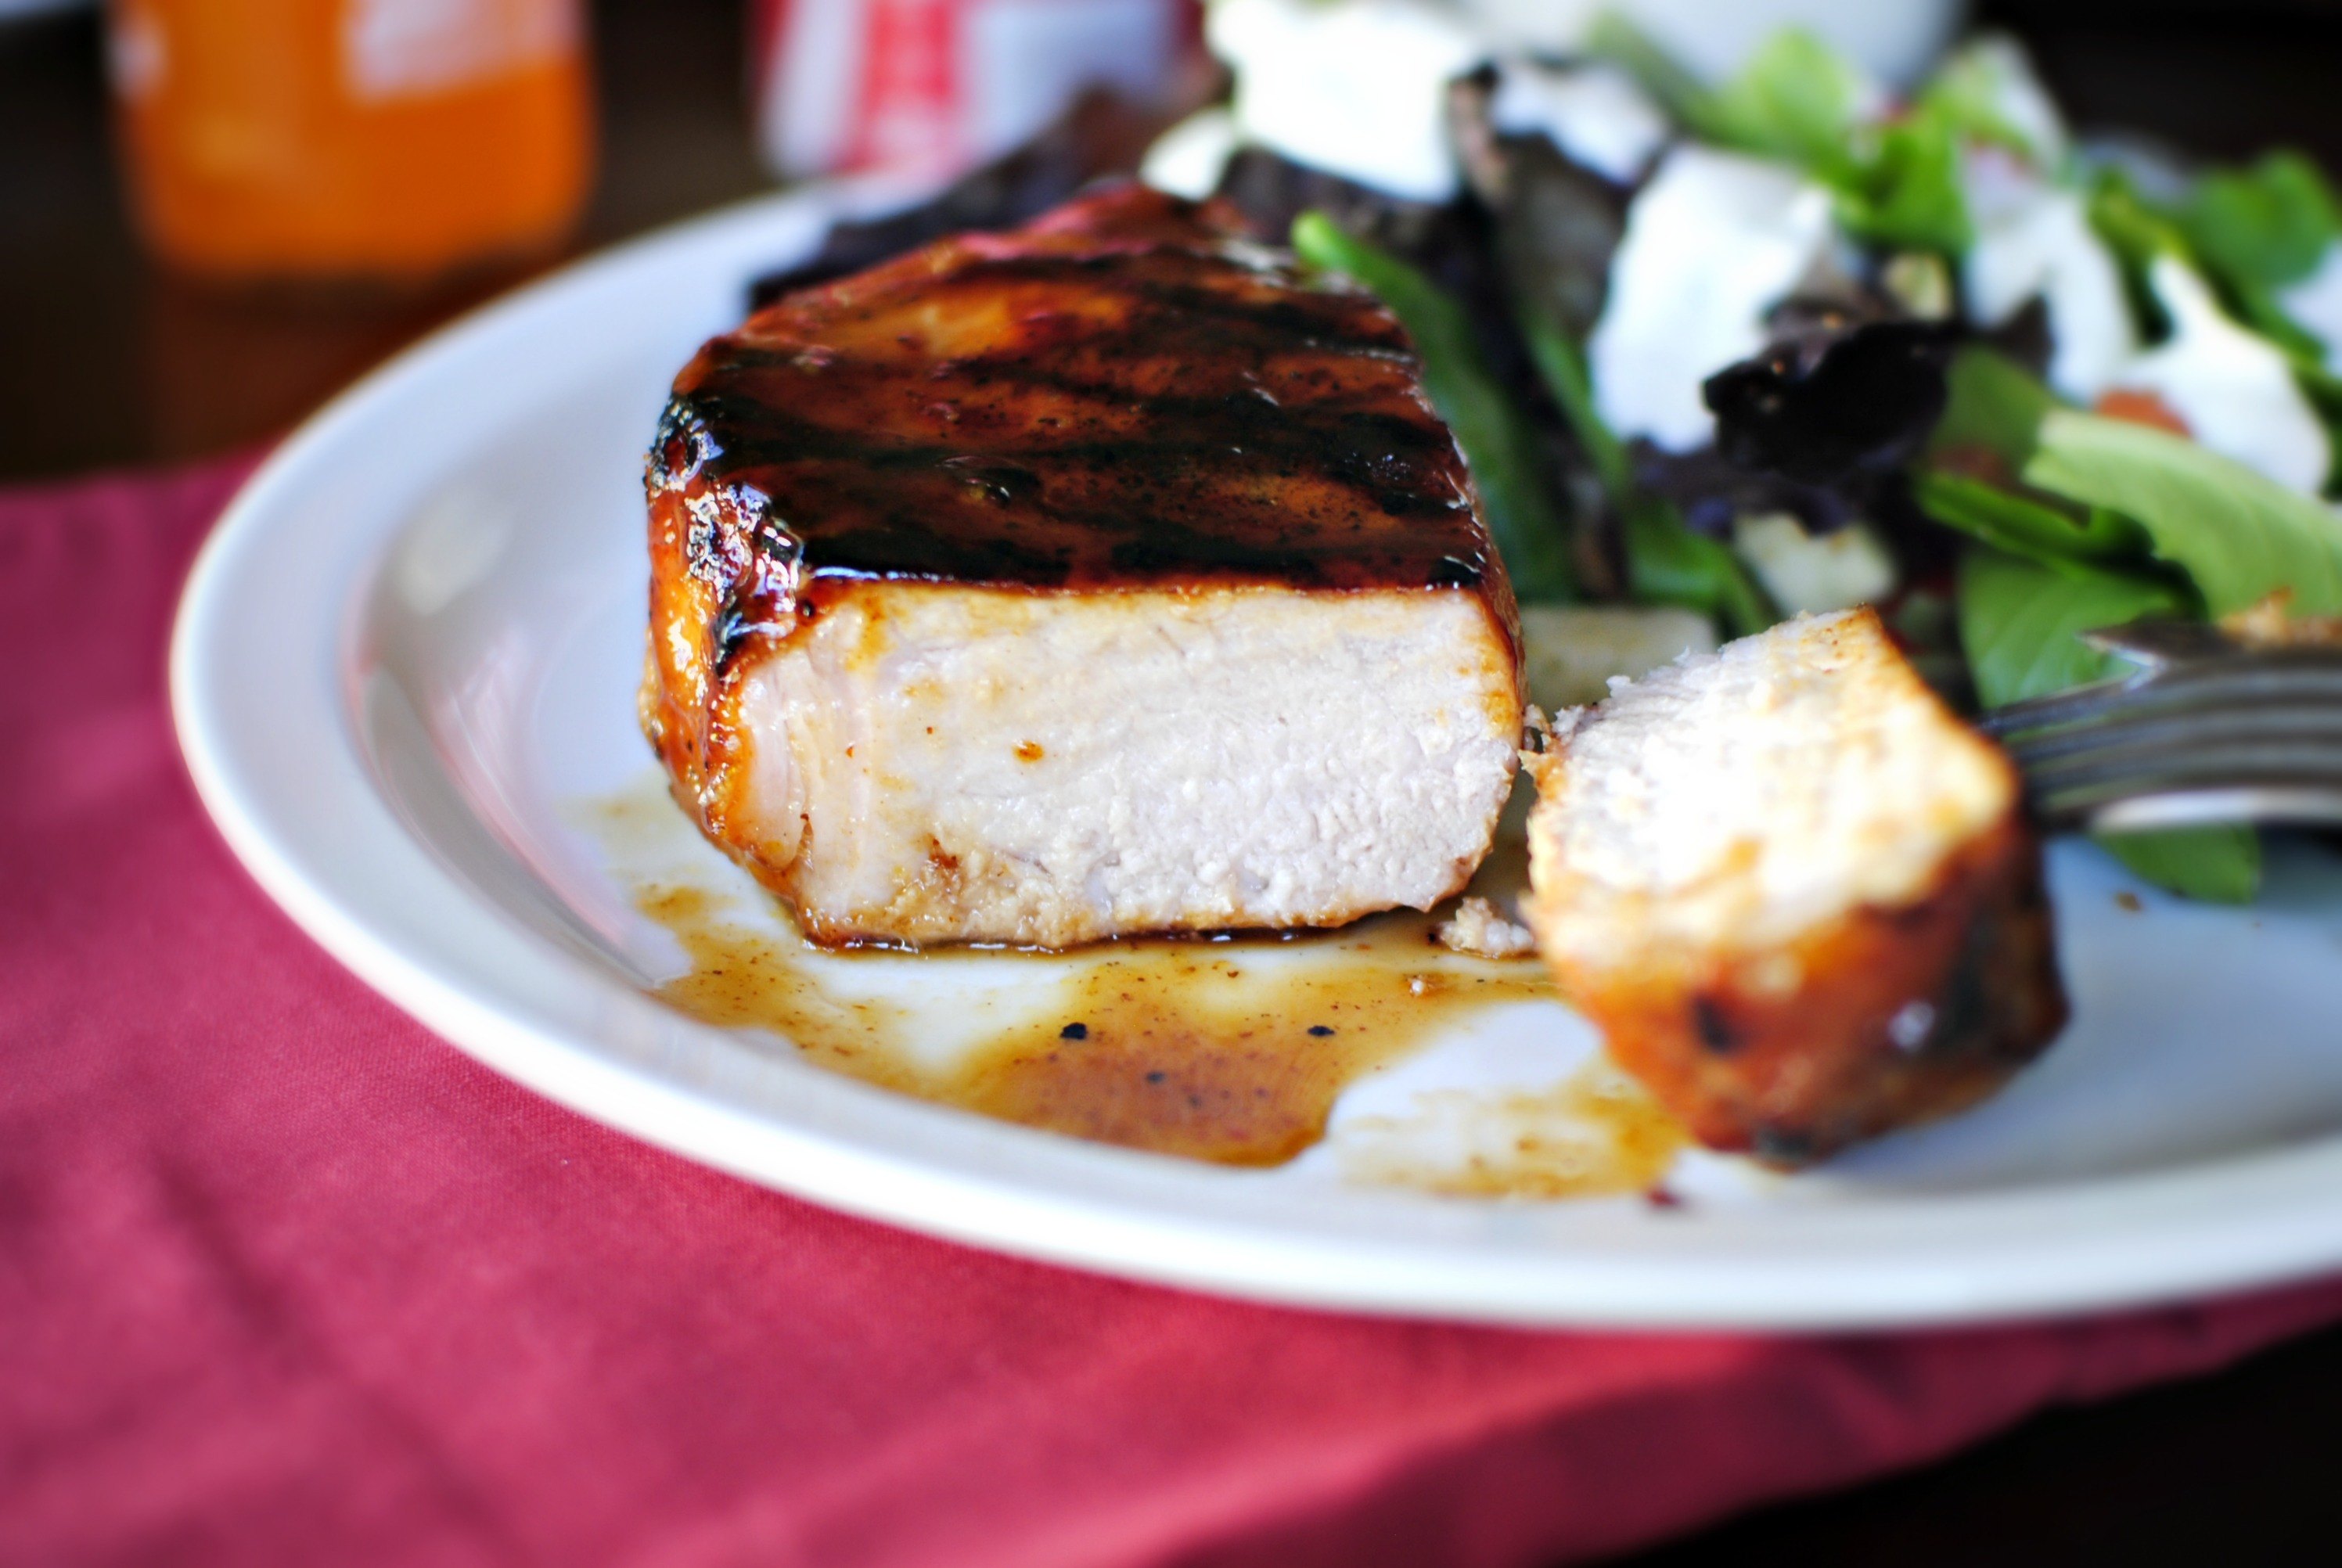 ... pan roasted pork chops with pan roasted pork chops with lemon pepper